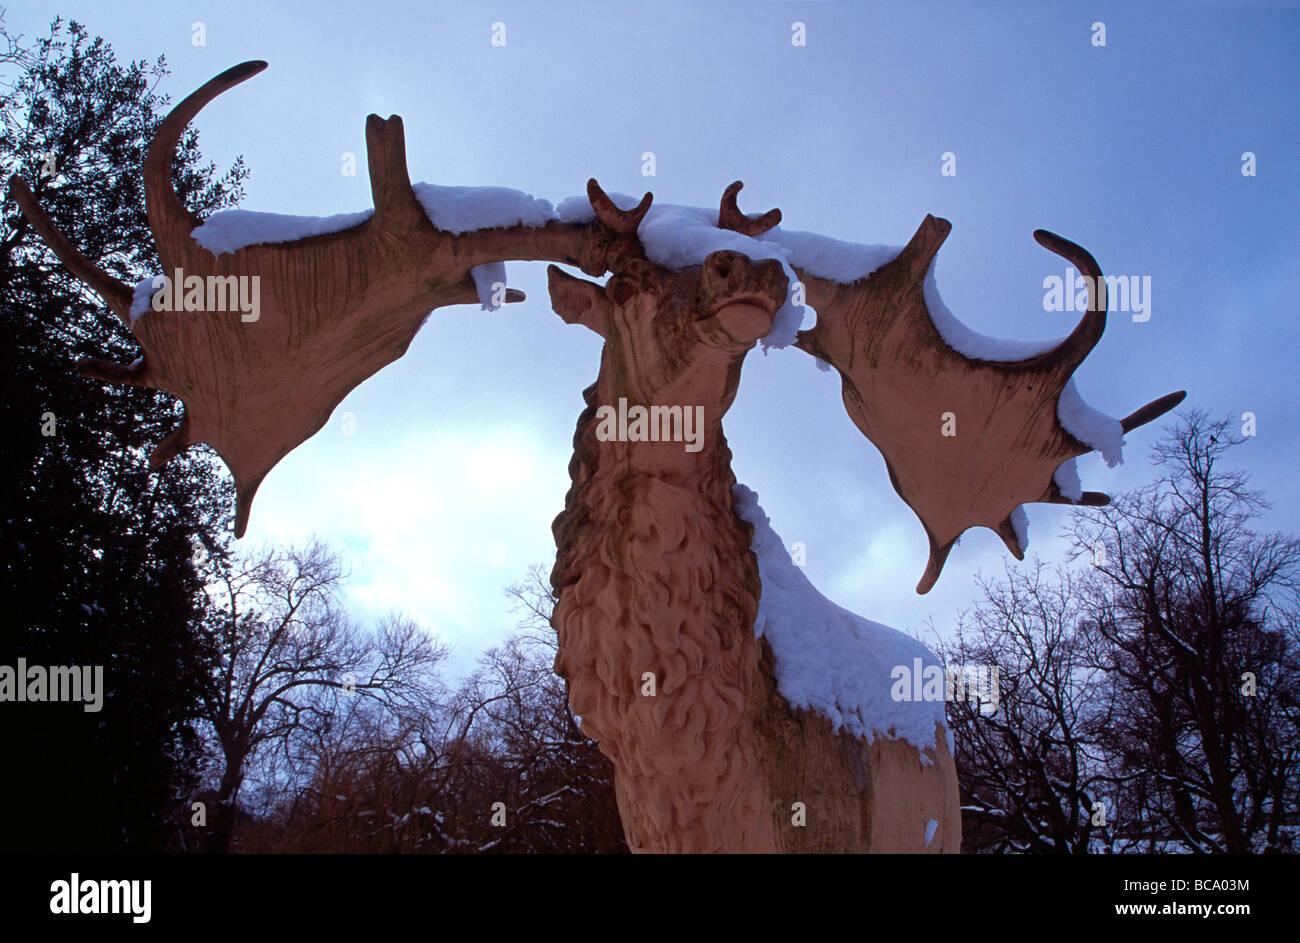 Victorian model of extinct Irish Elk, Crystal Palace Park South London England UK Stock Photo